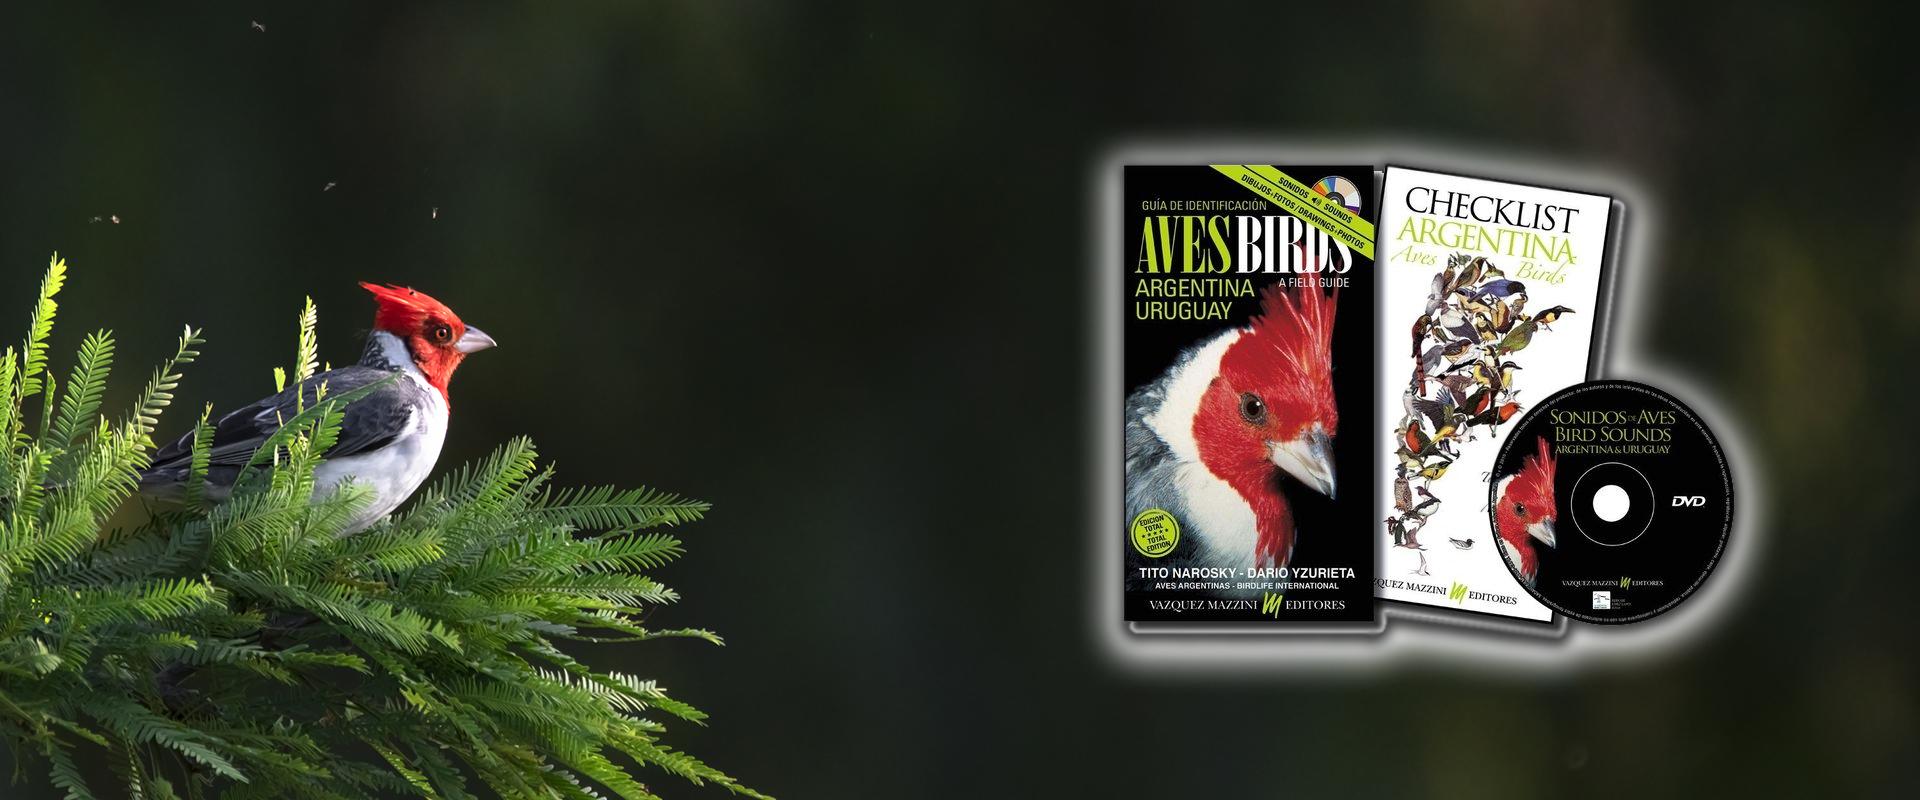 guia de aves de argentina